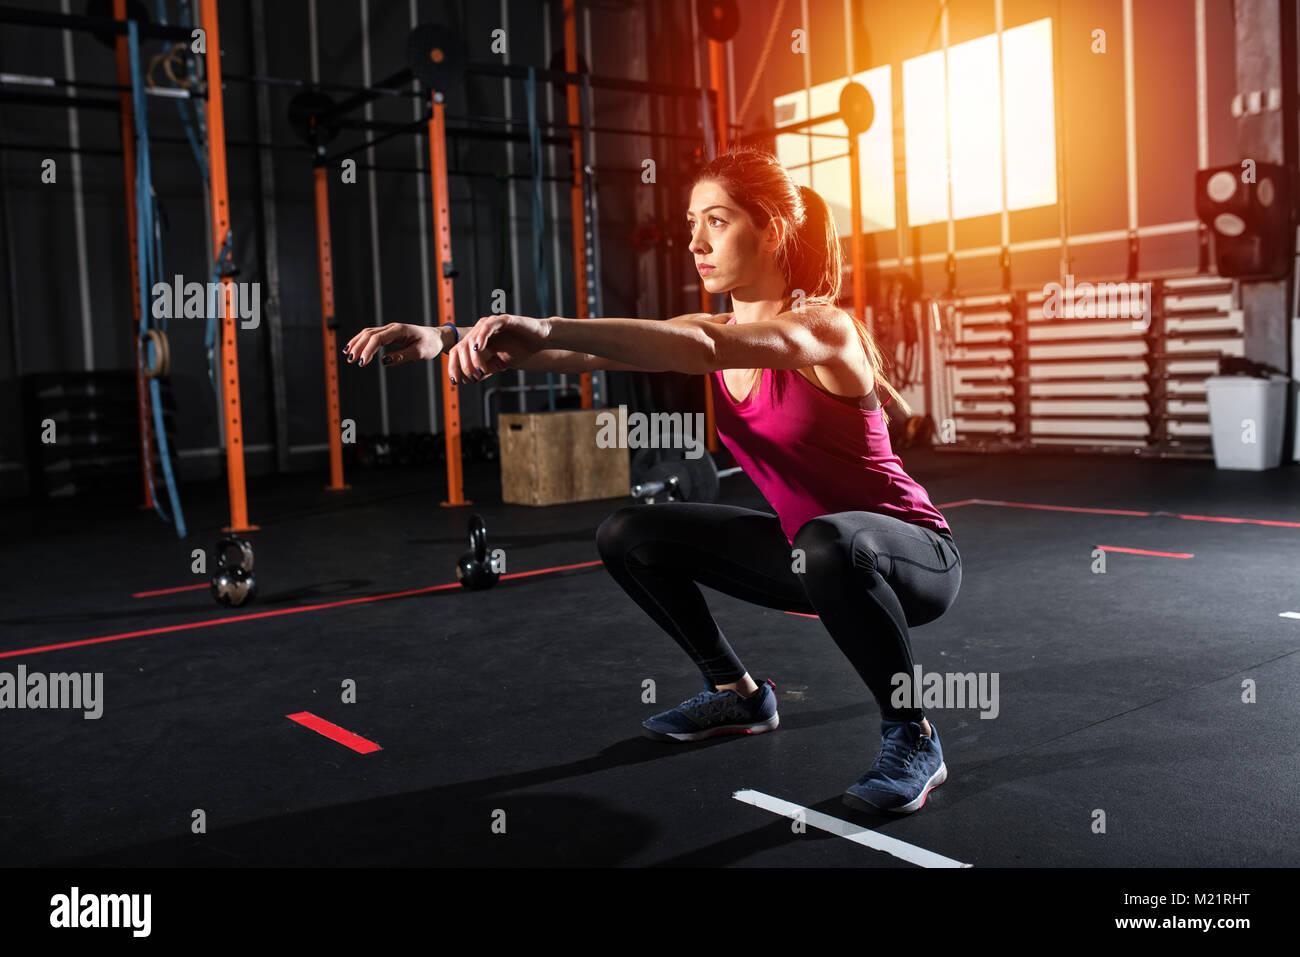 Athletic Girl ne squat exercice dans la salle de sport Photo Stock